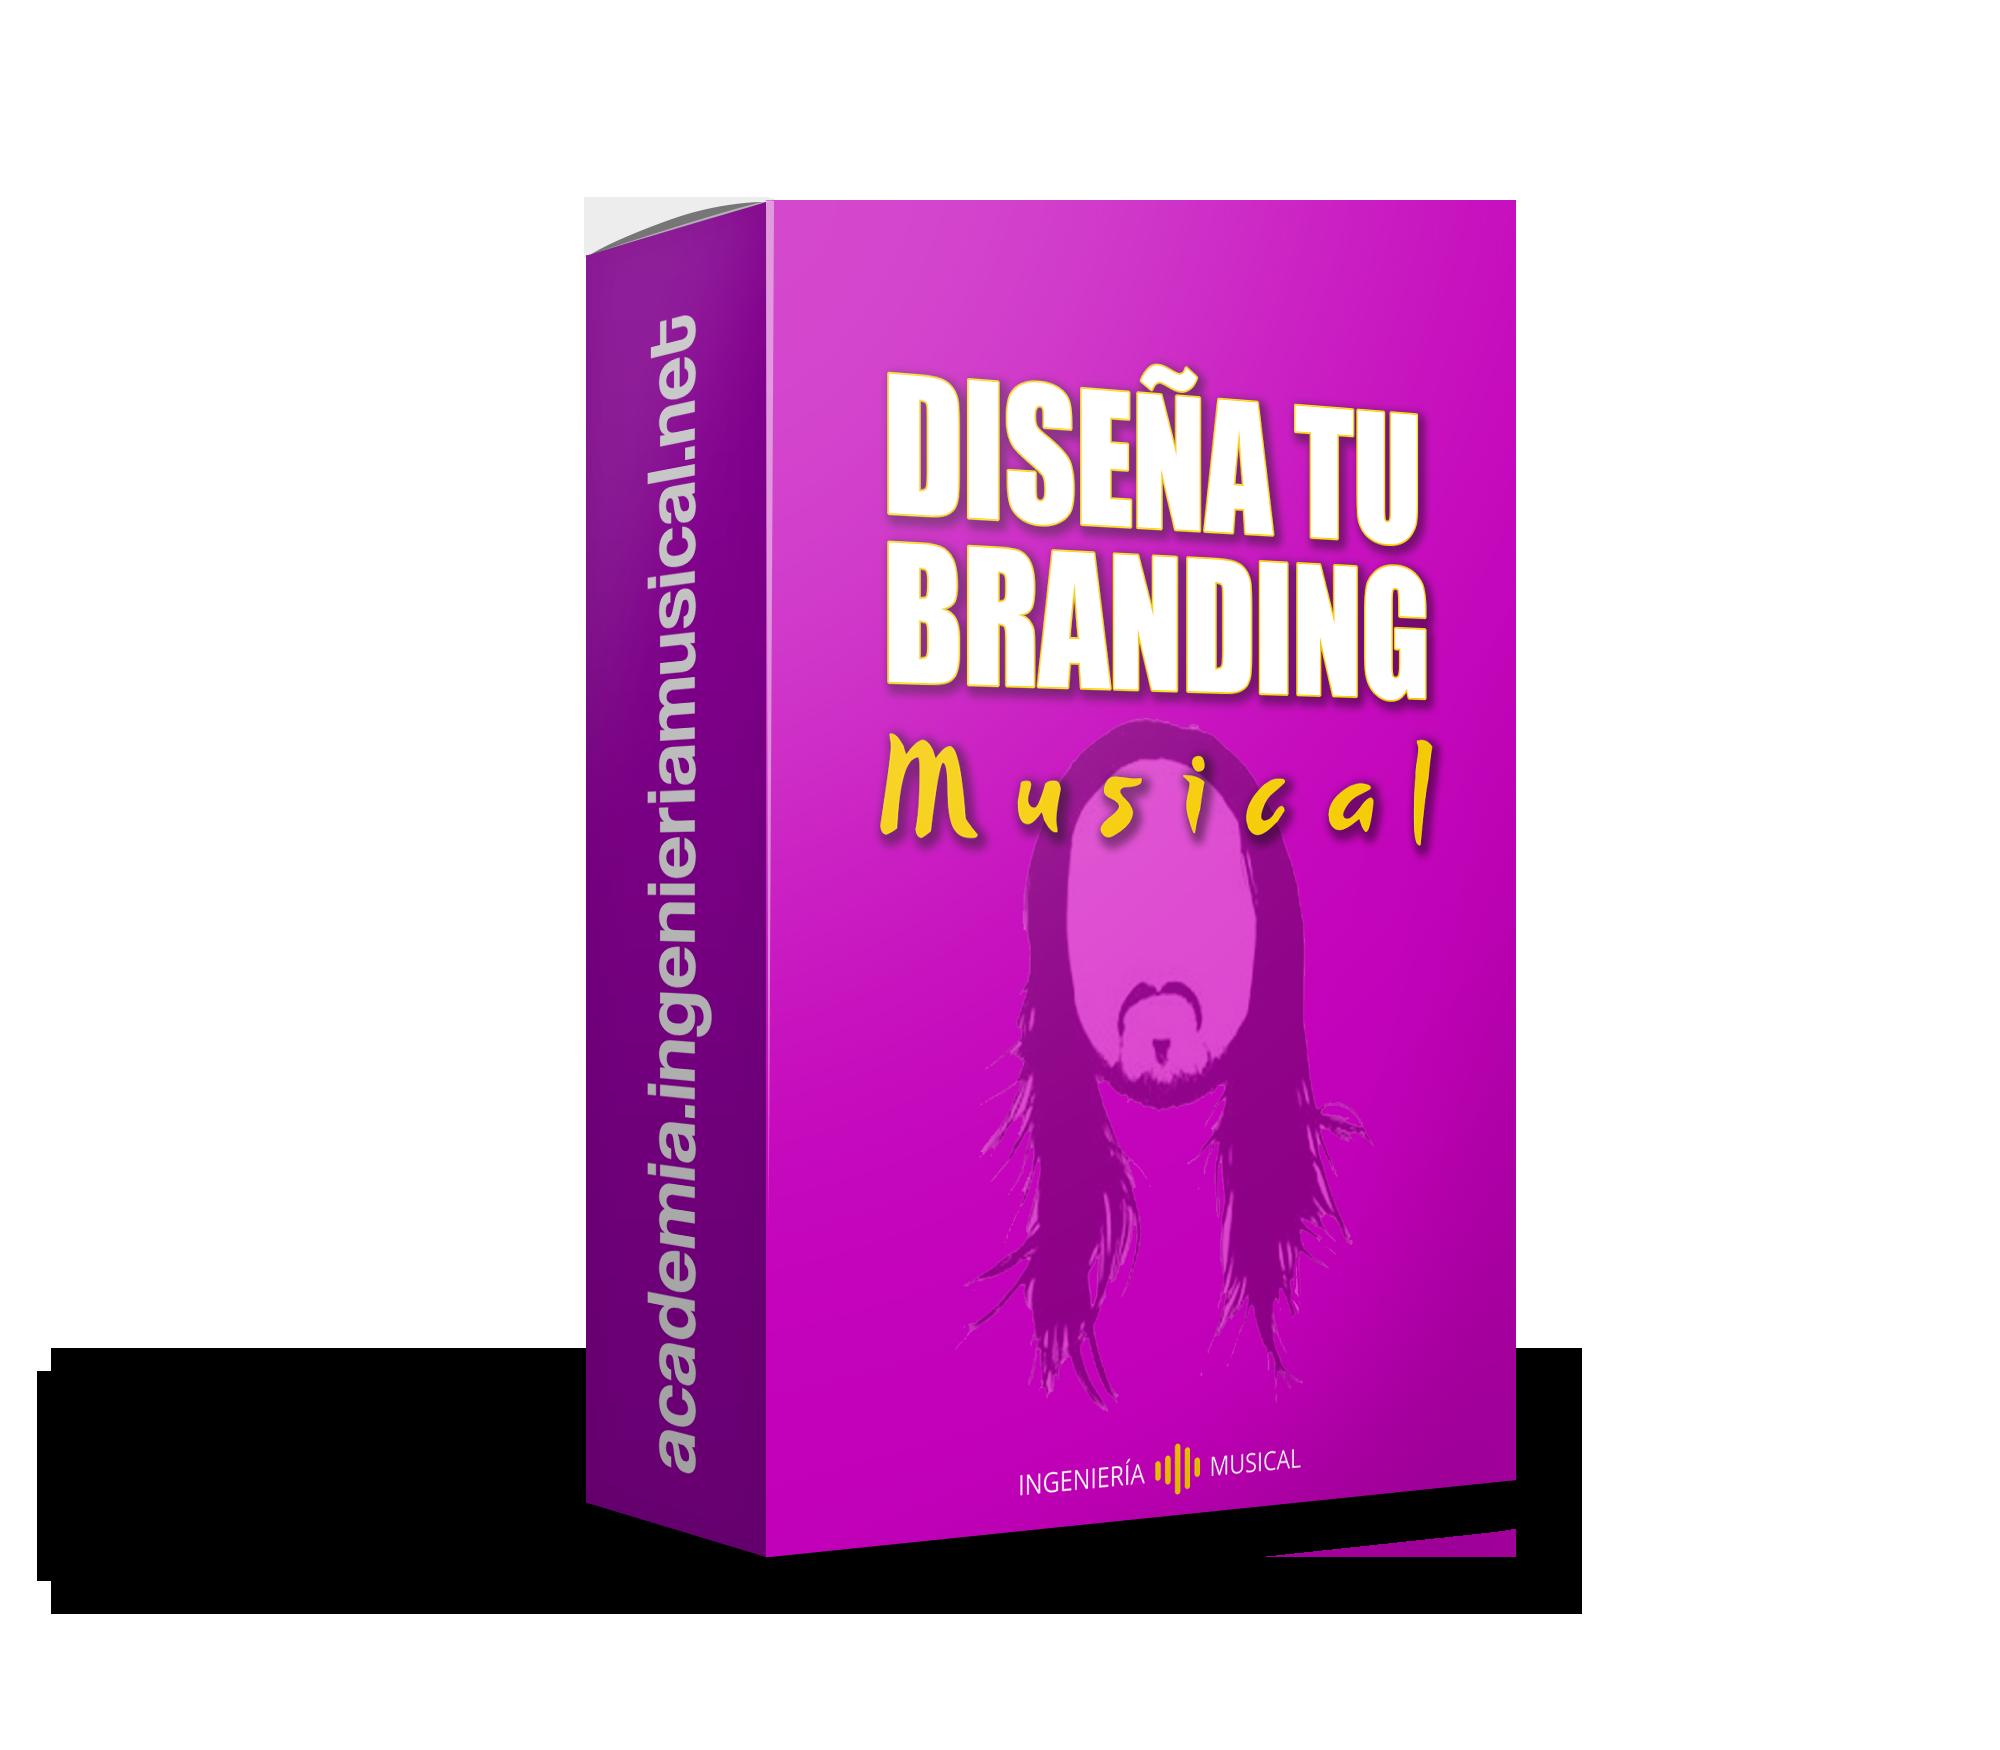 Diseña tu branding musical